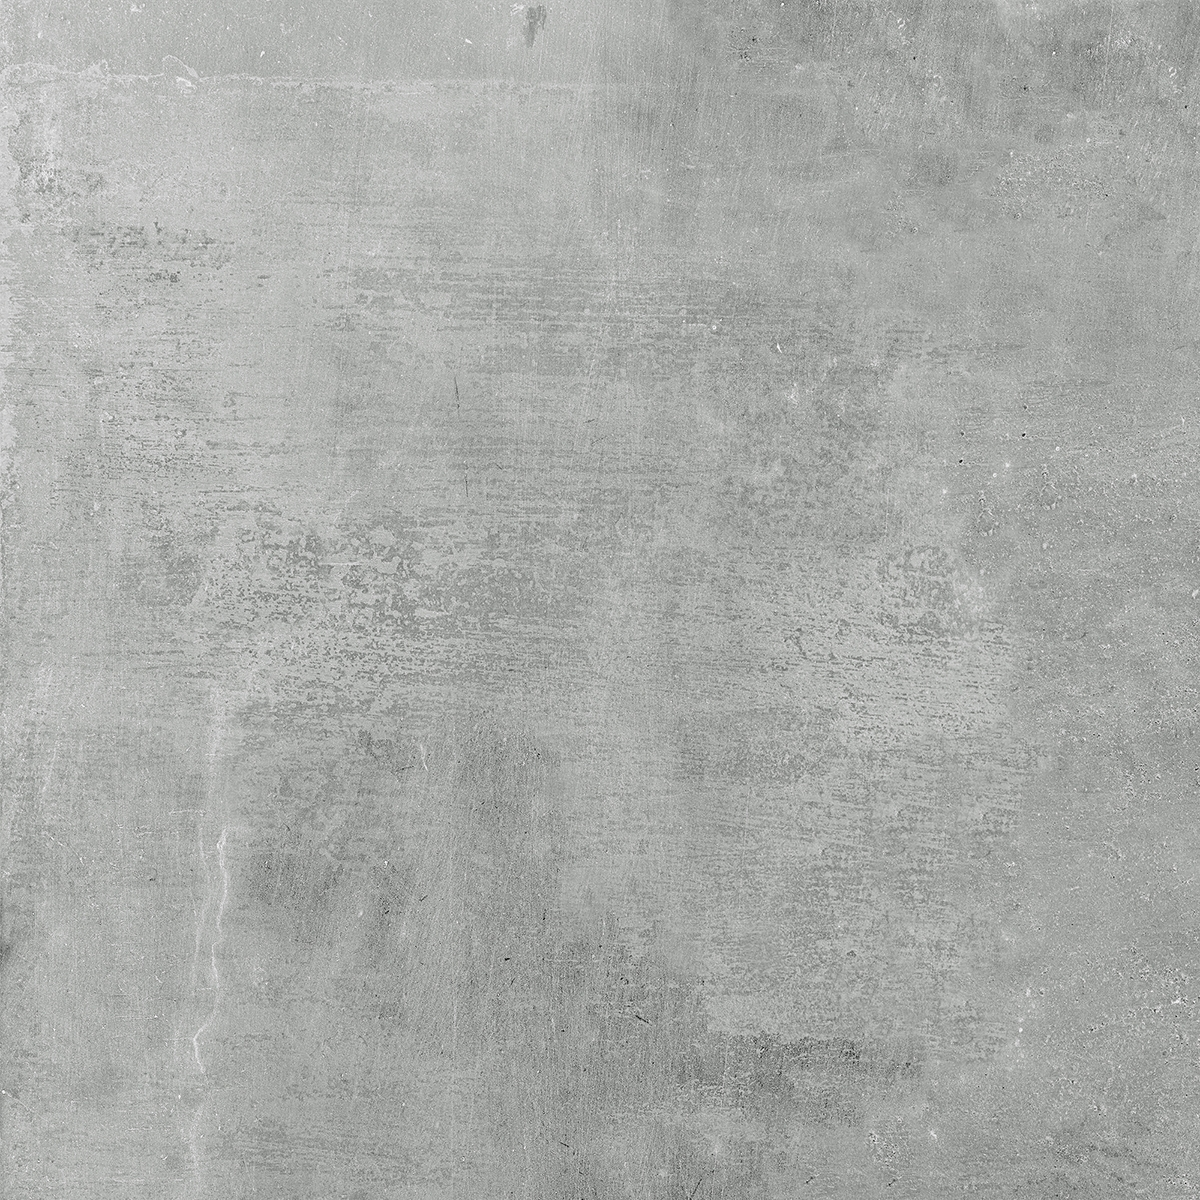 NIO grey Image